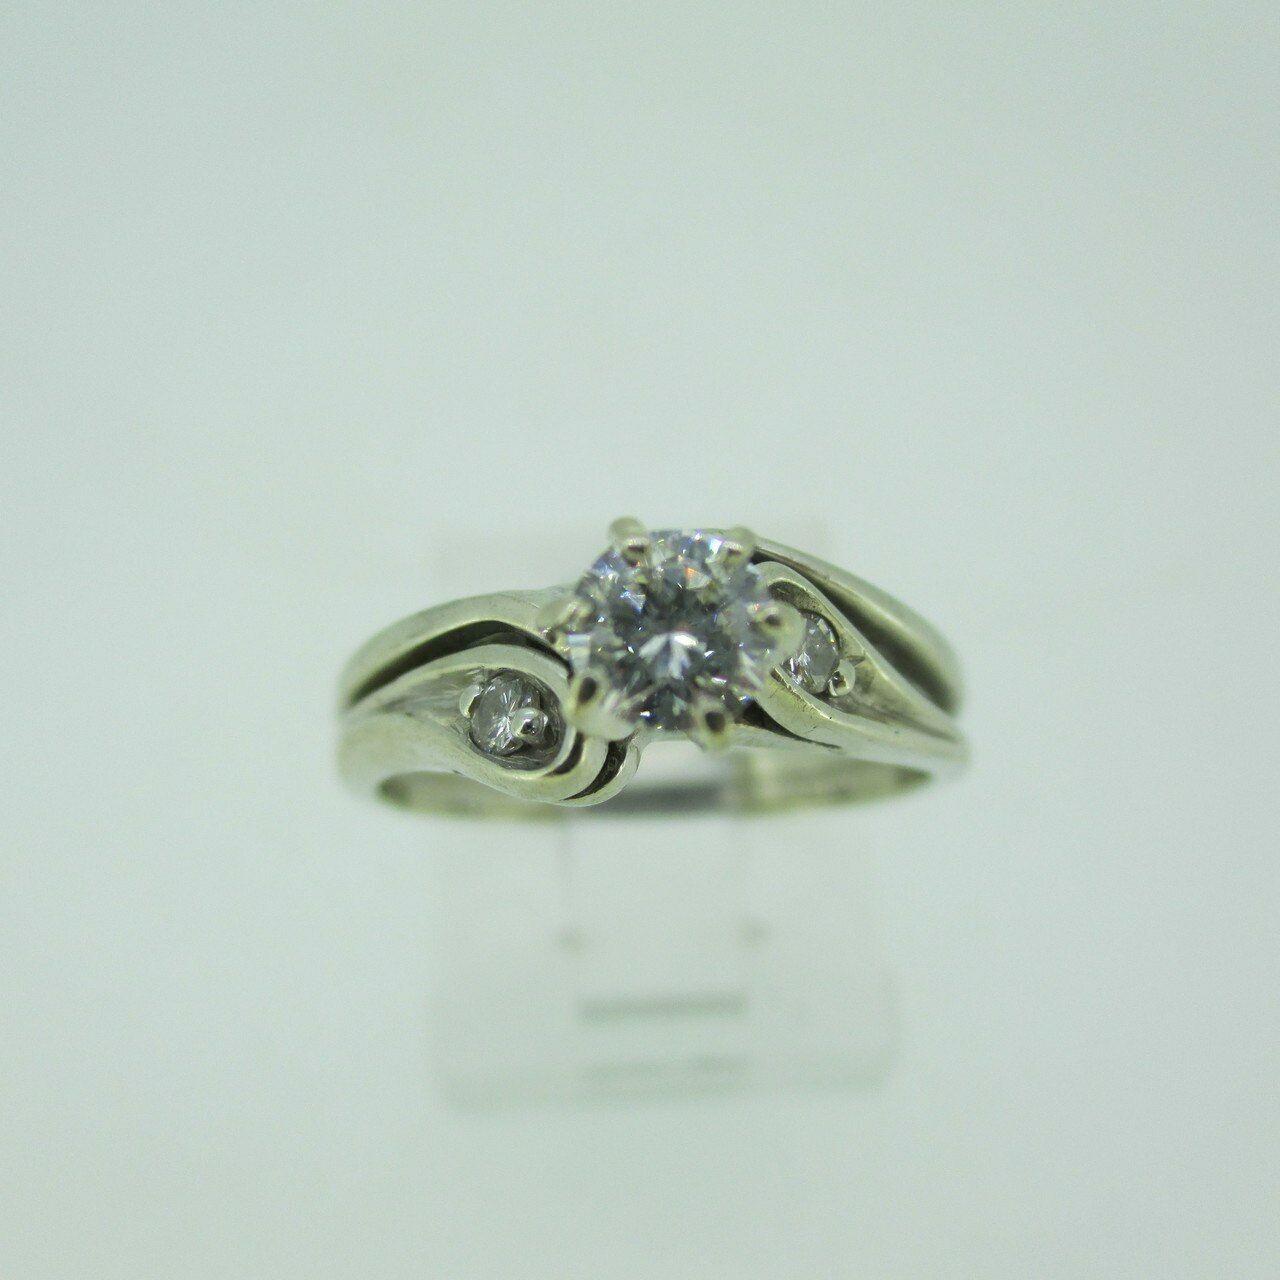 14k White gold Approx 1 3ct Round Brilliant Cut Diamond Wedding Ring Size  6